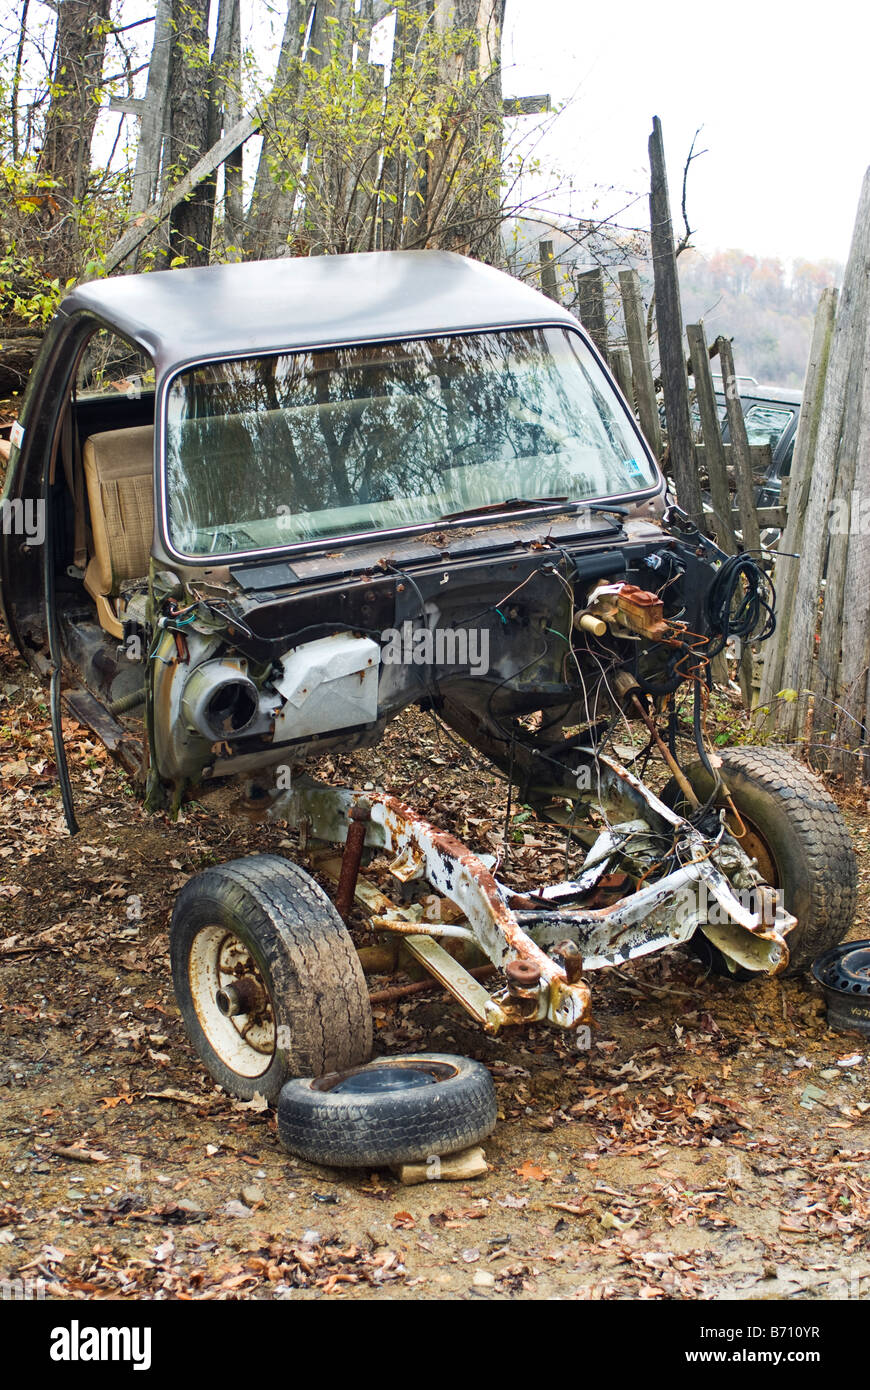 Automobile Junkyard Parts Cars Sale Stock Photos & Automobile ...